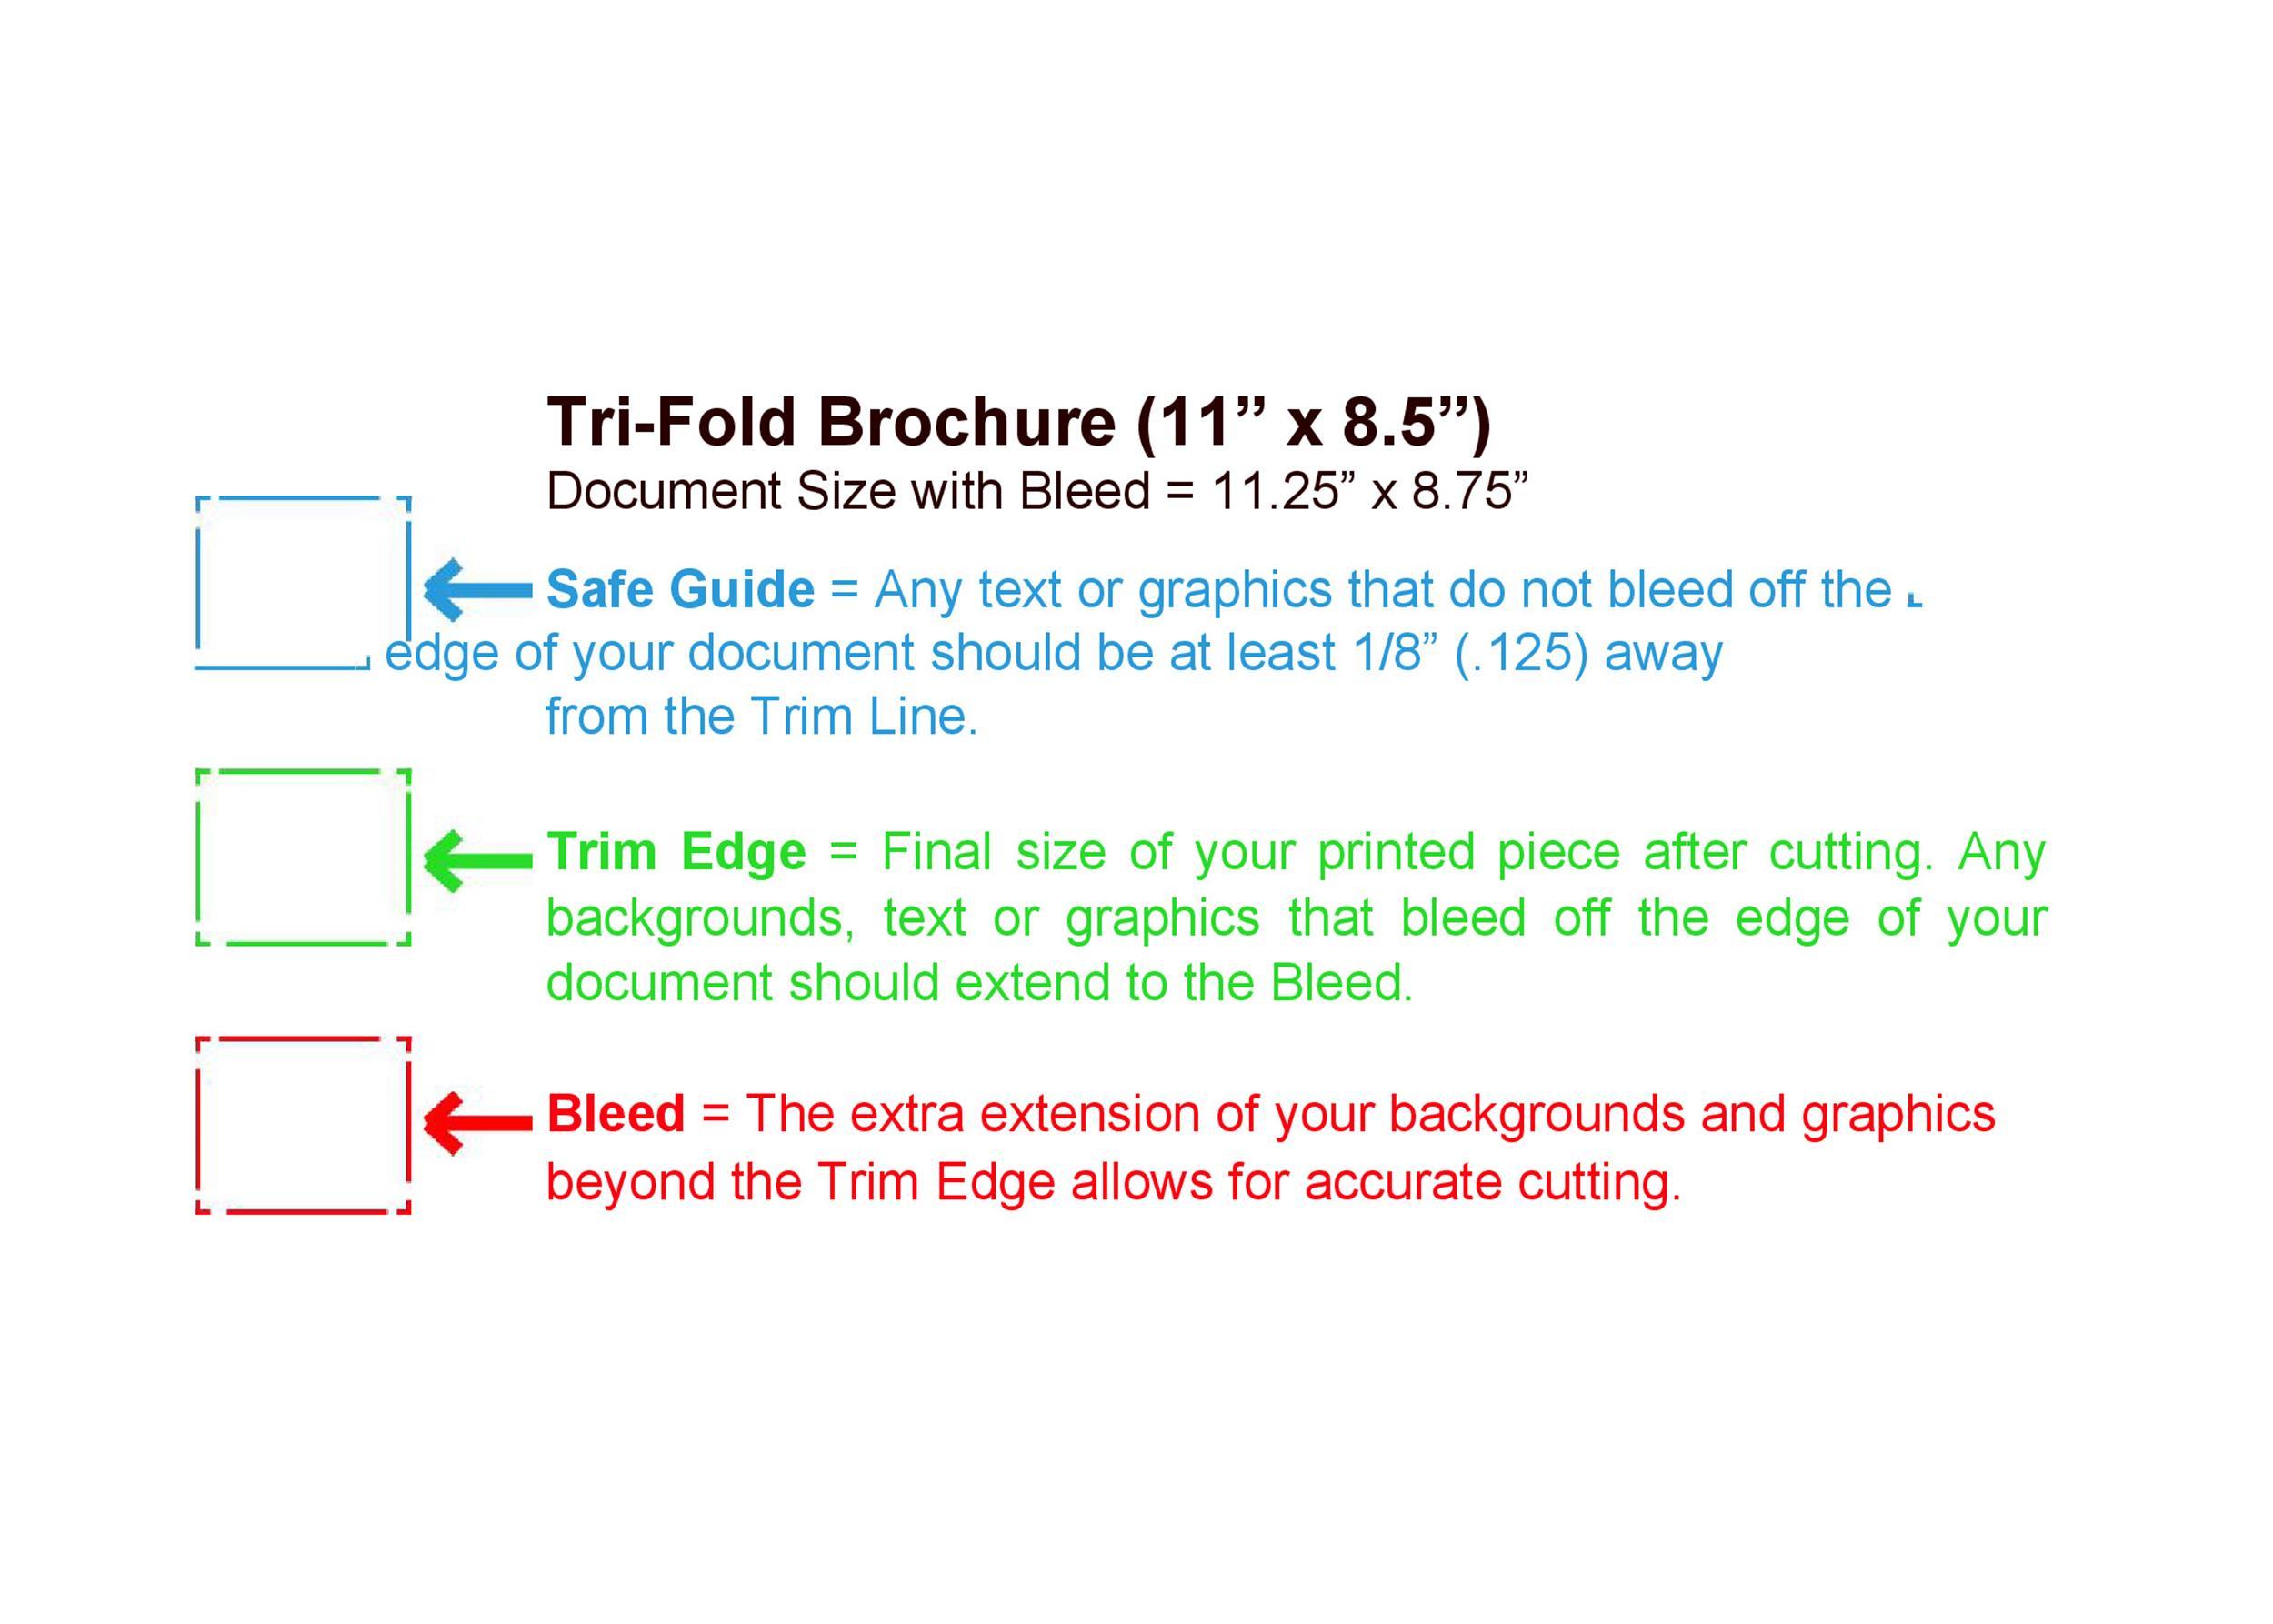 40 FREE Pamphlet Templates [Word / Google Docs] ᐅ TemplateLab